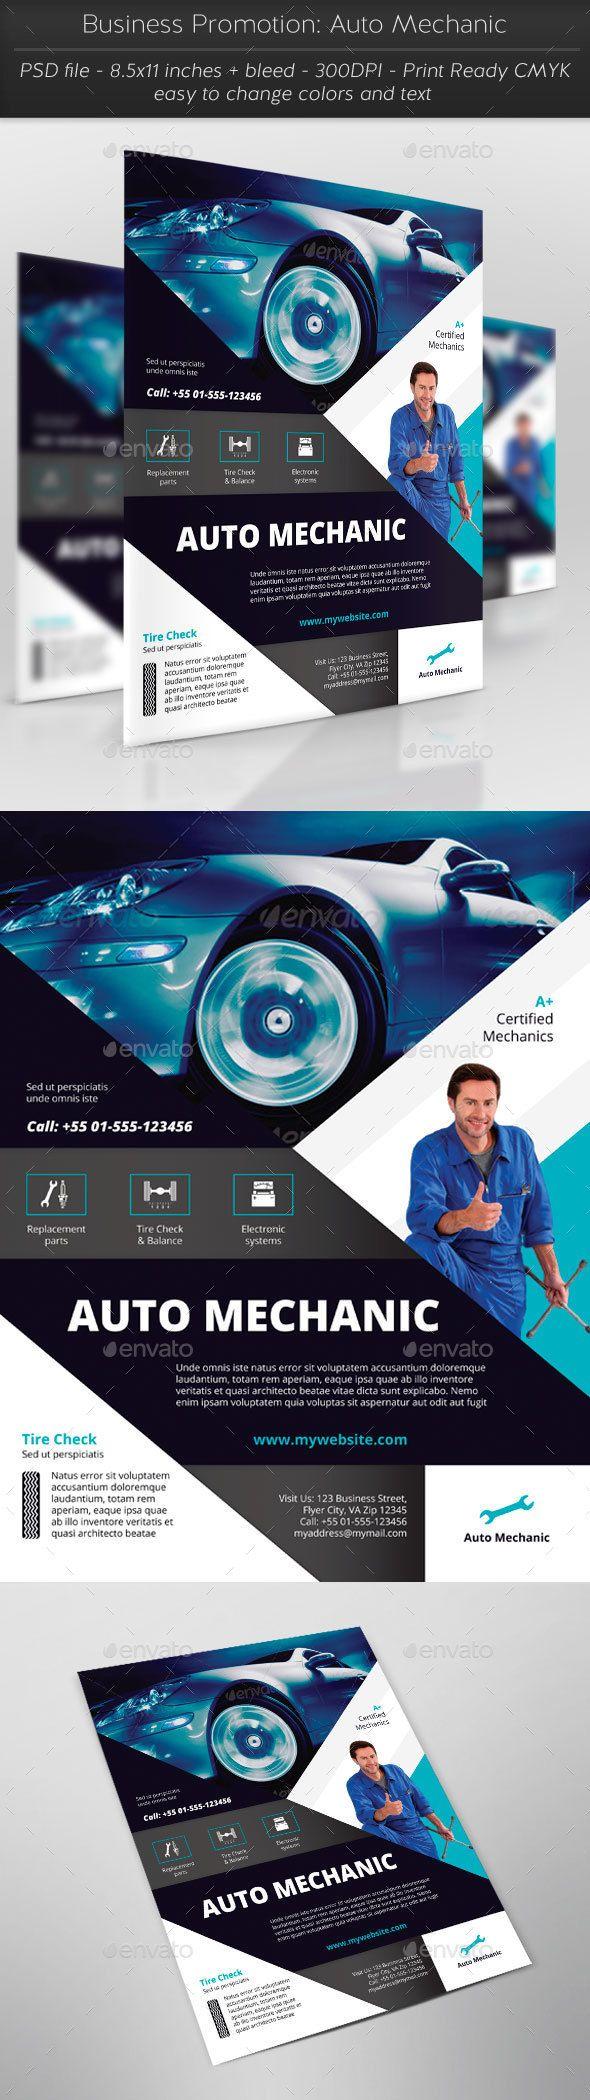 business promotion auto mechanic